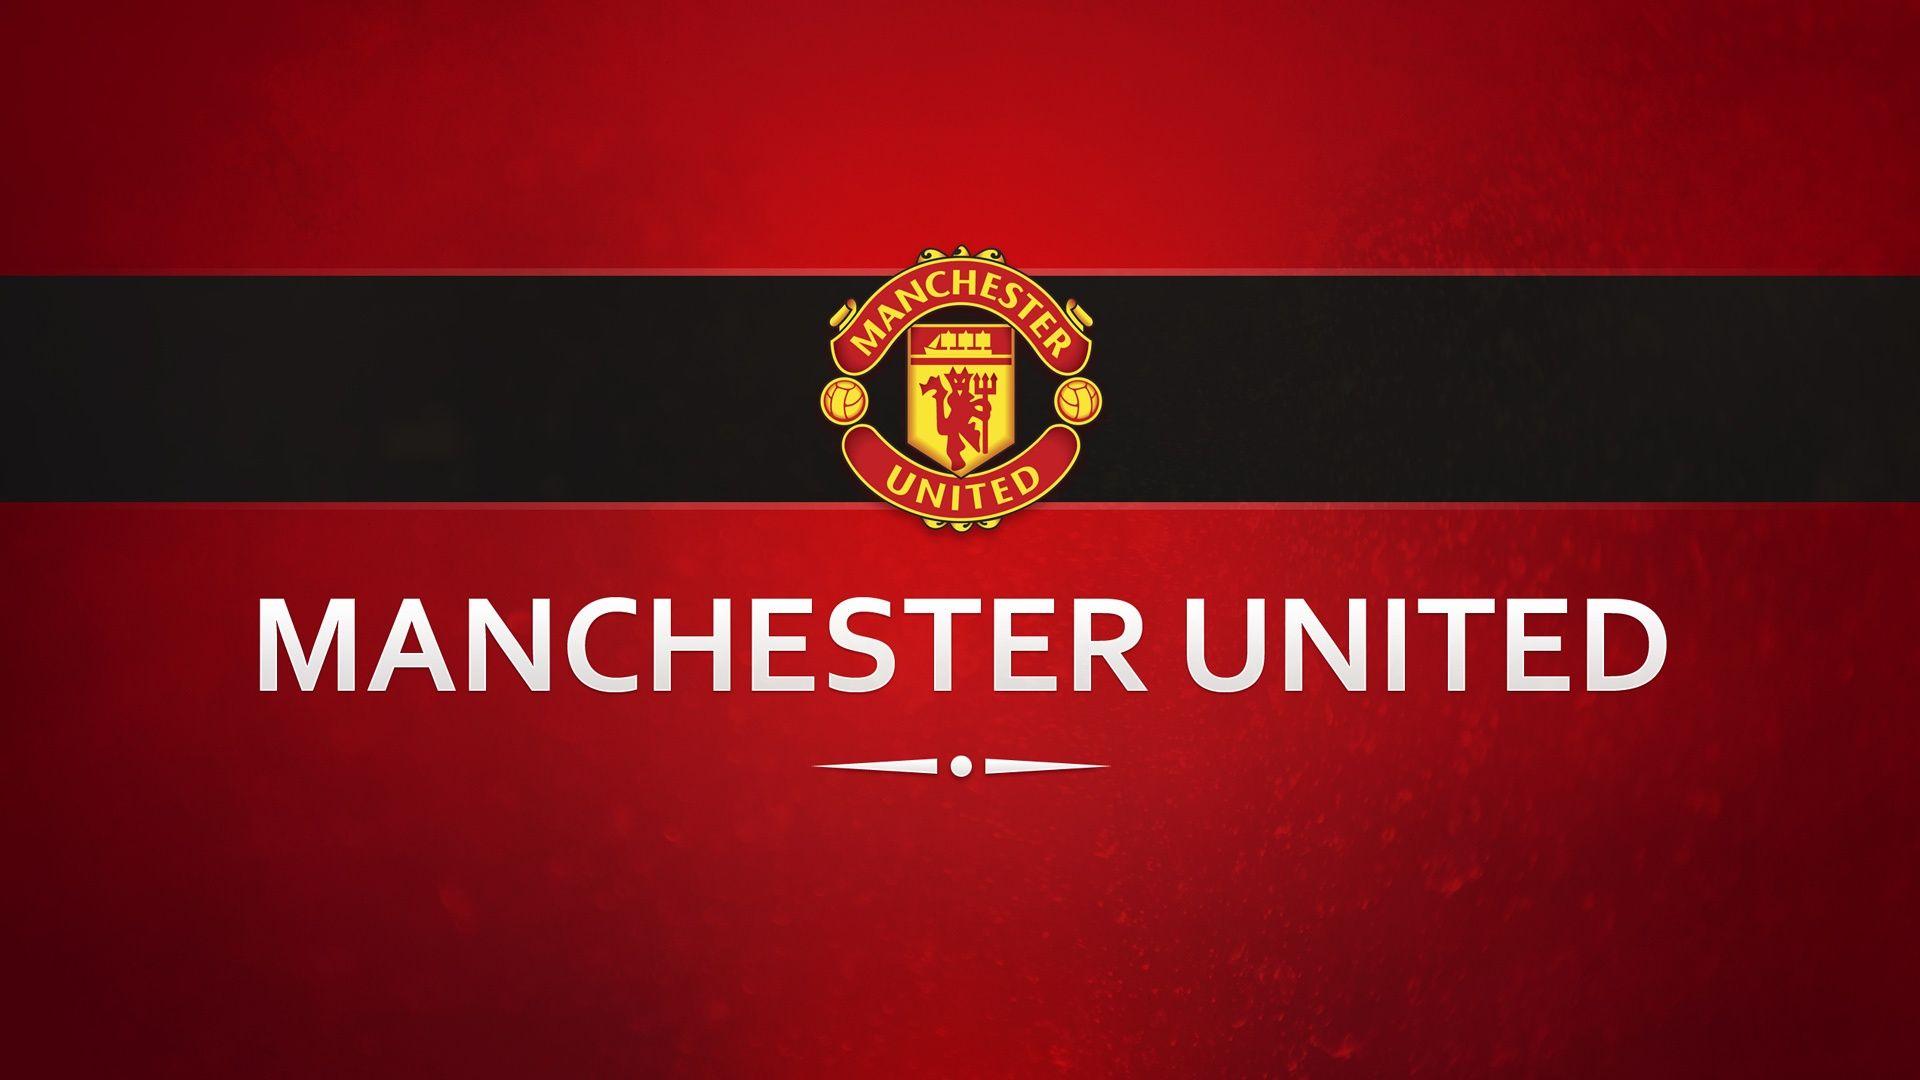 Manchester United Wallpaper HD aaa Manchester united wallpaper 1920x1080